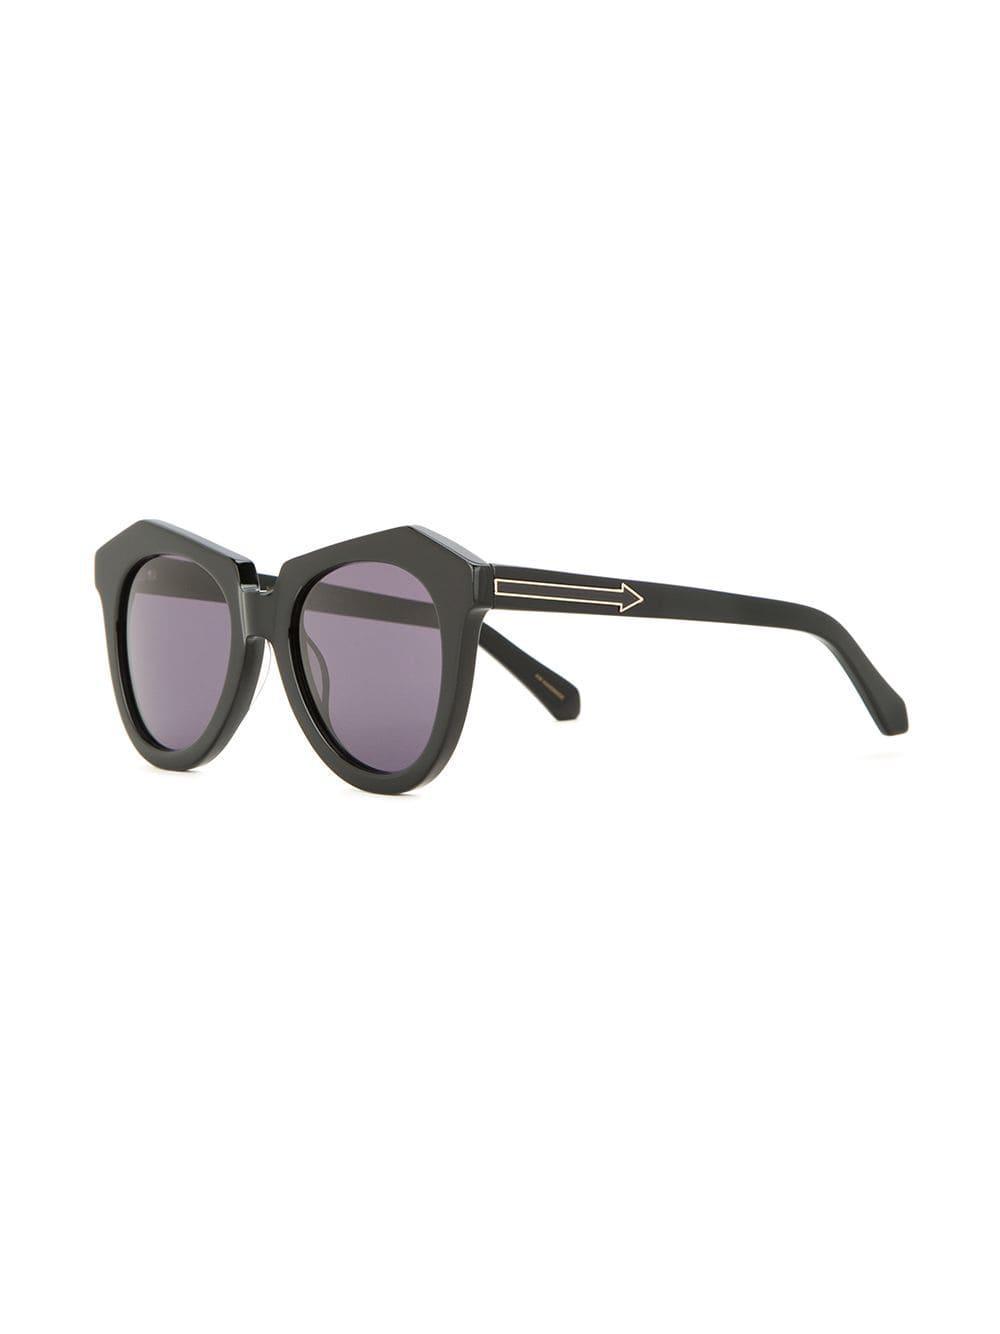 417689a3a051 Lyst - Karen Walker Number One Sunglasses in Black